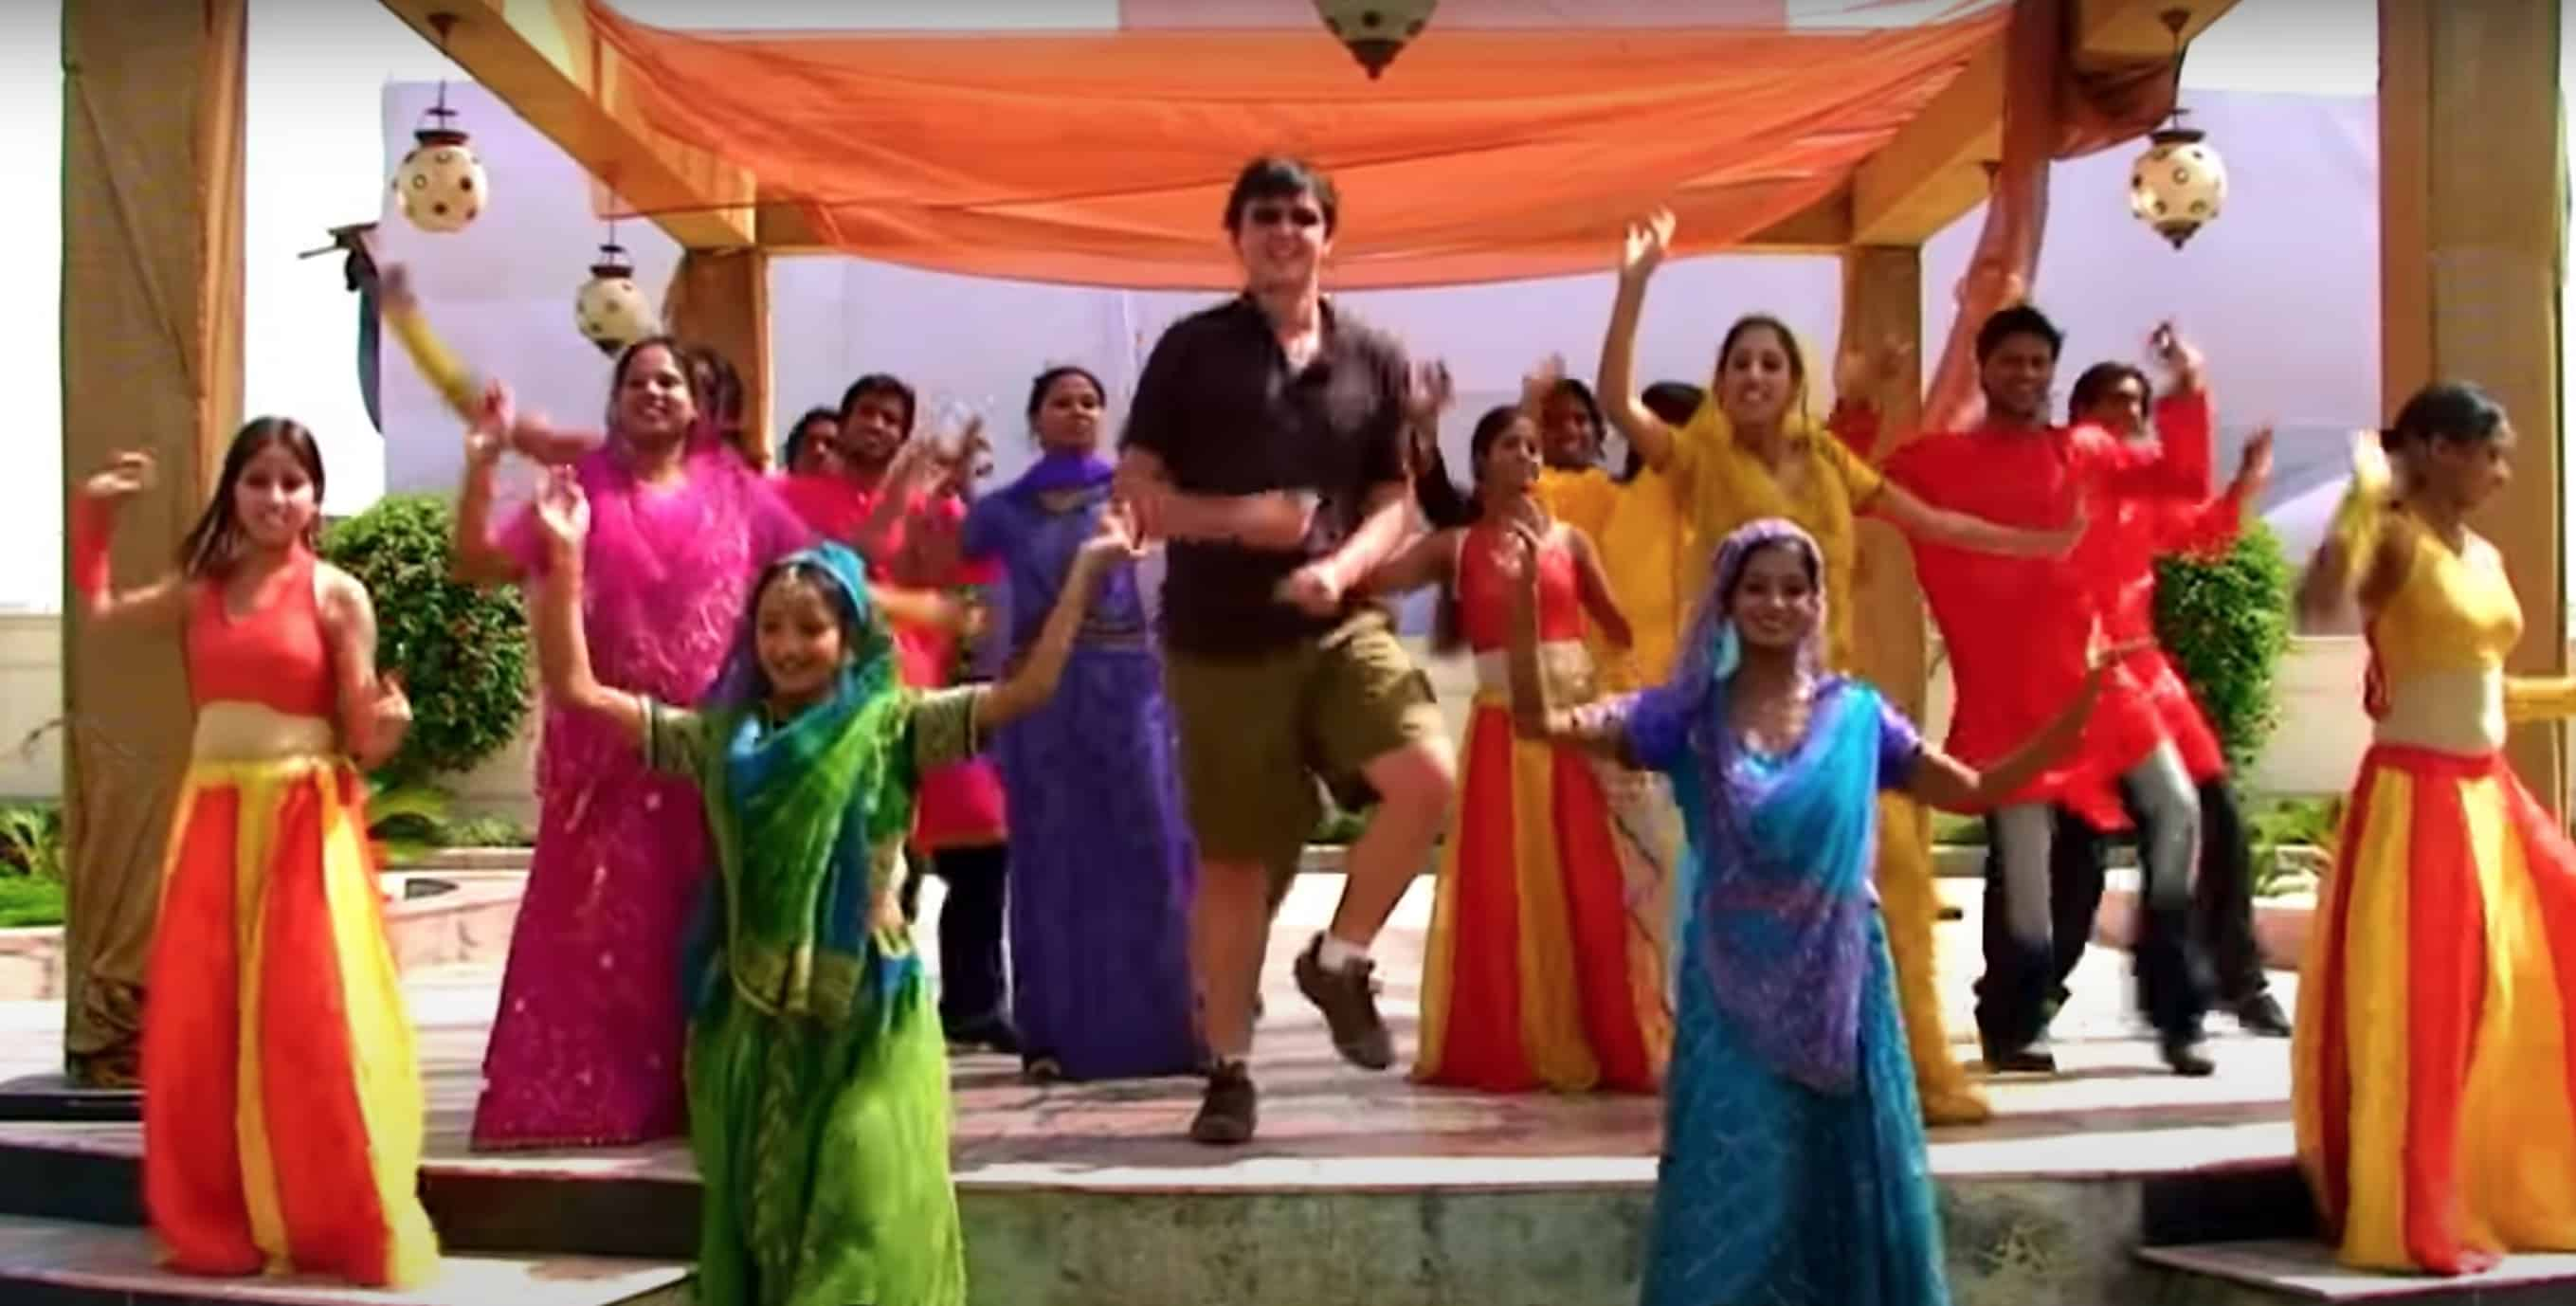 Matt Harding dancing